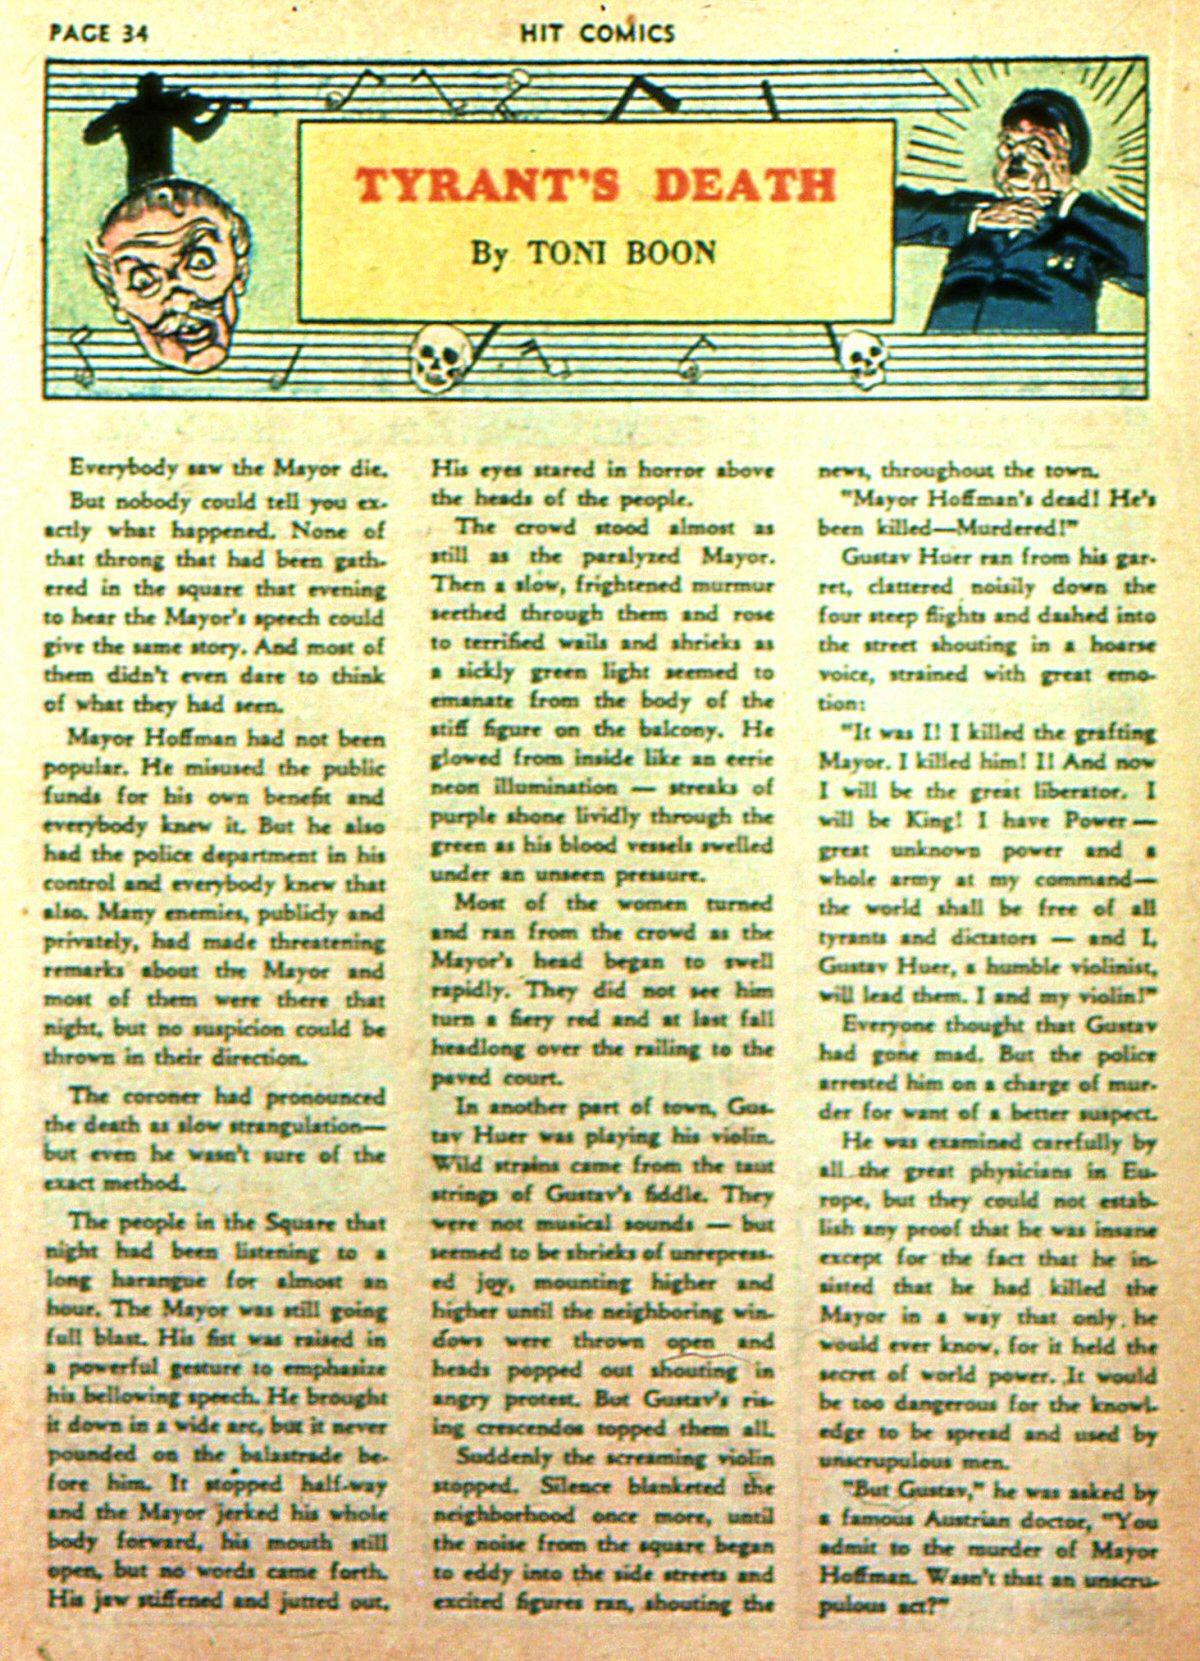 Read online Hit Comics comic -  Issue #2 - 36